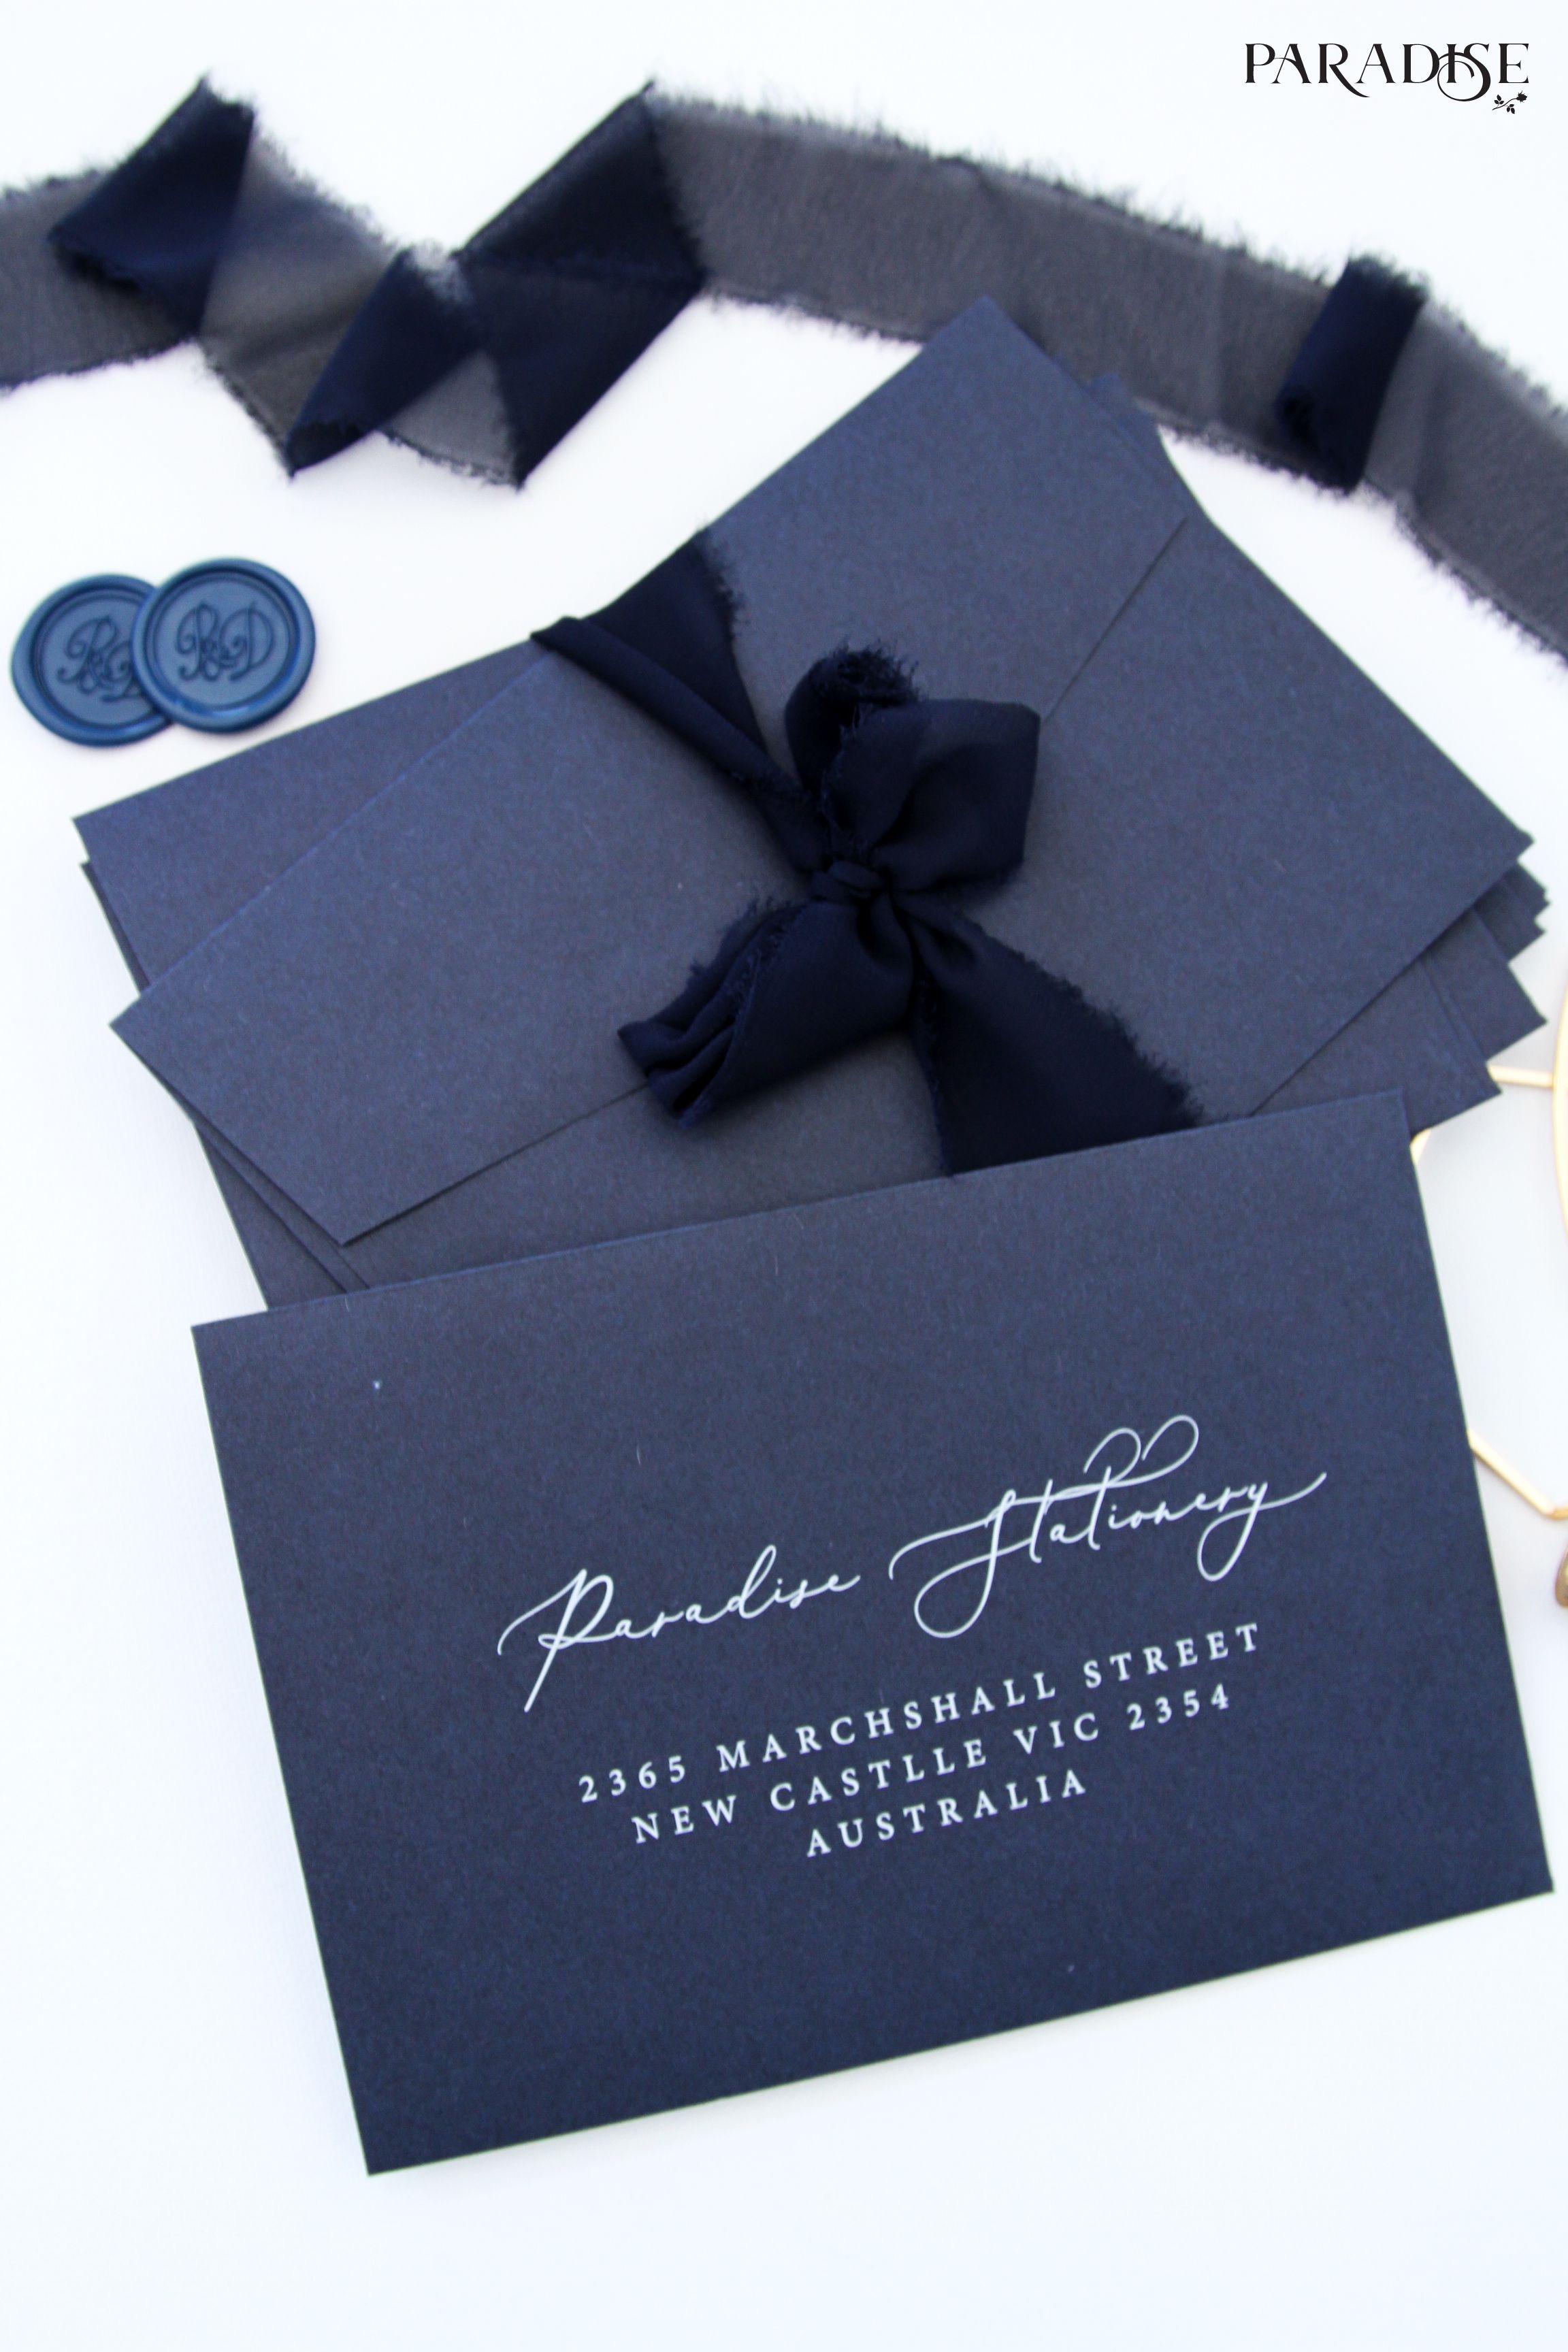 Navy Blue Envelopes White Ink Elegant Envelope Lace Ribbon Wax Seal Free Wedding Invitation Samples Wedding Envelopes Blue Envelopes